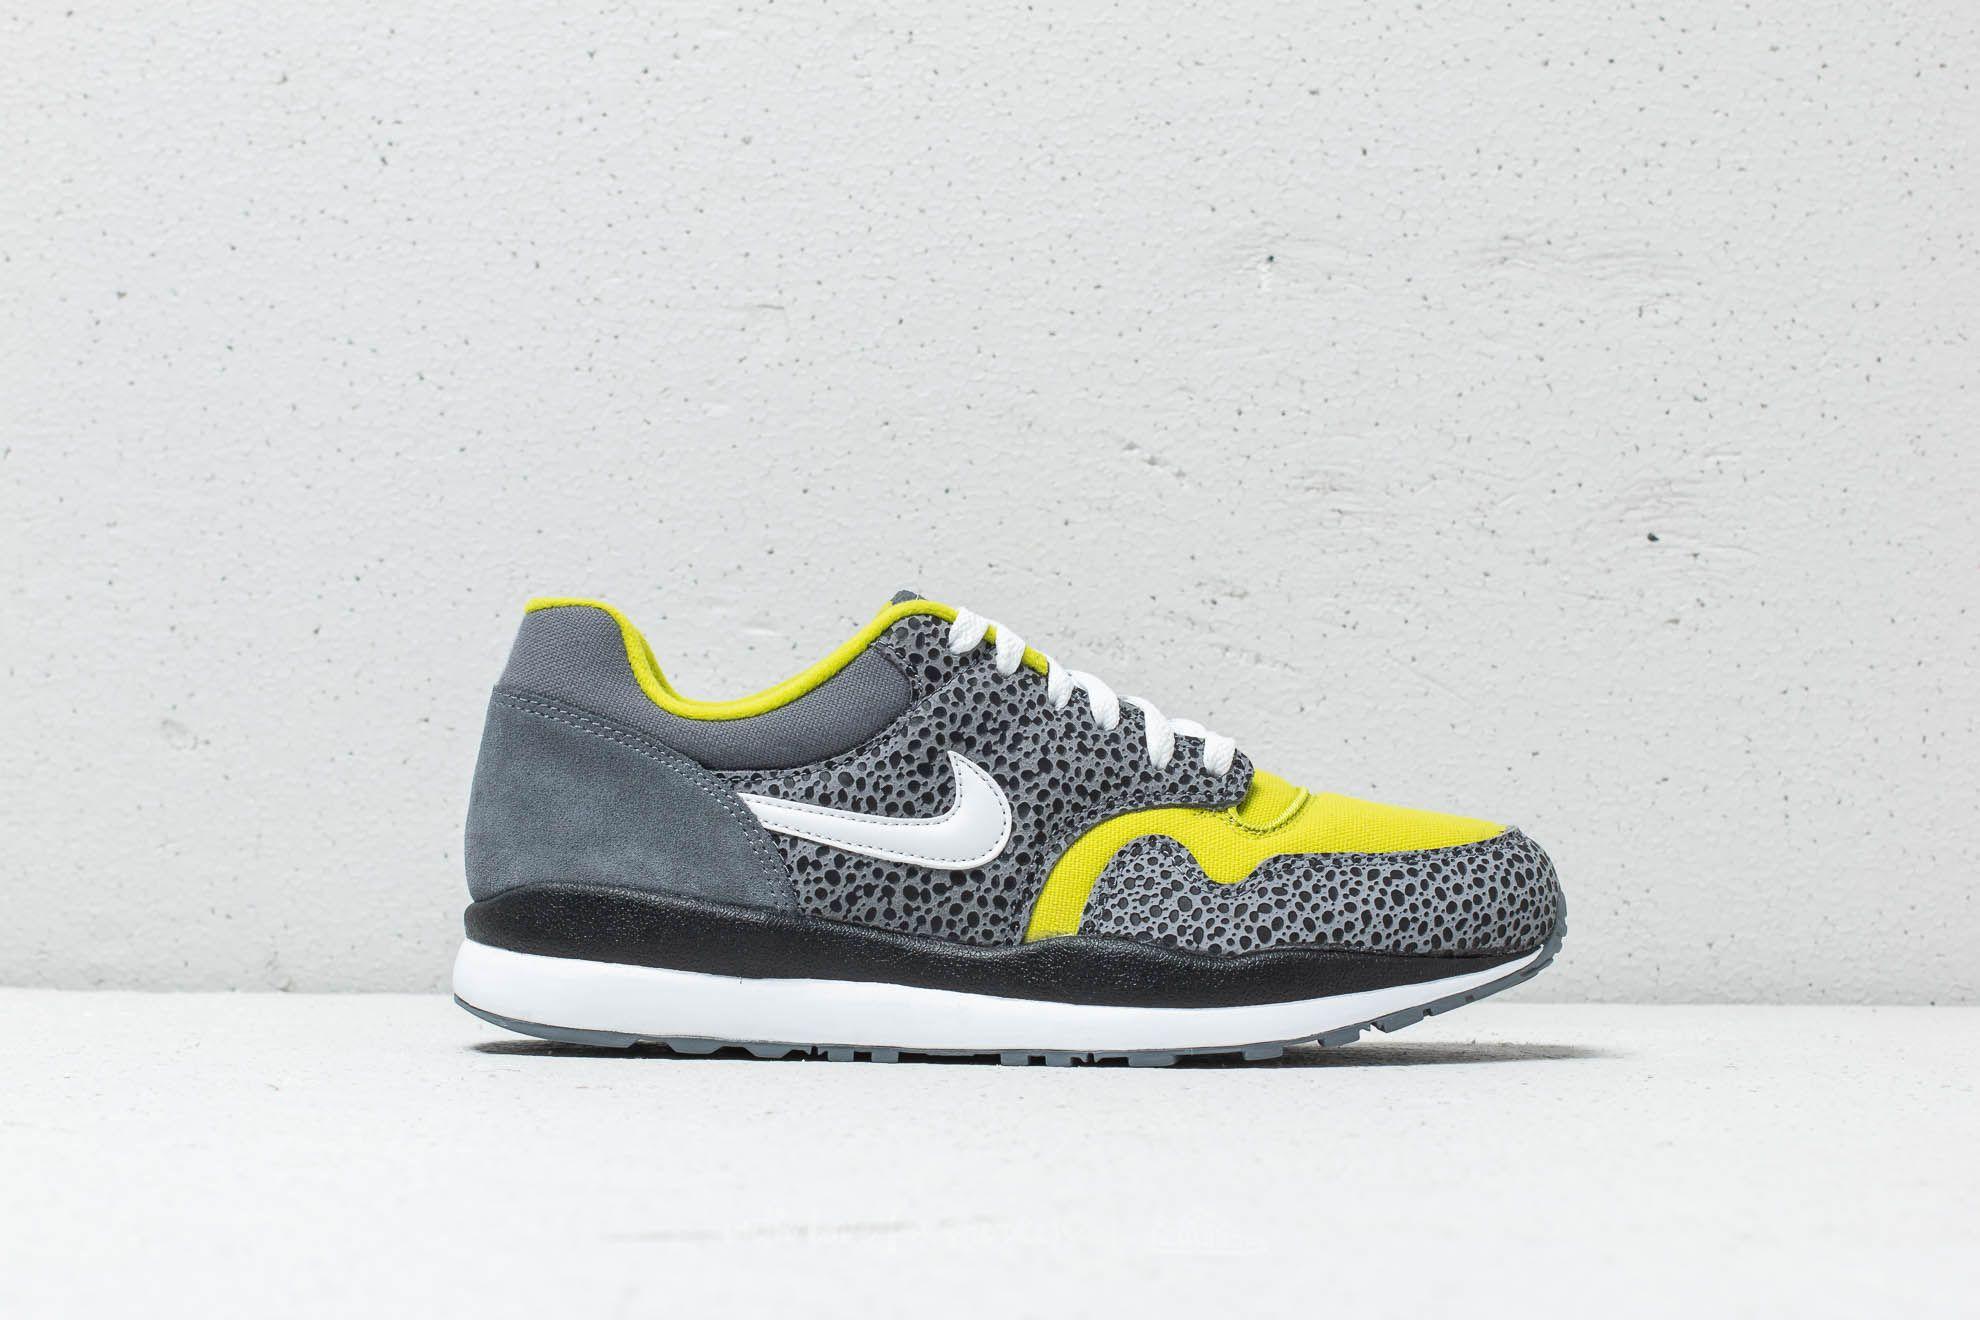 cd717758a39 Nike Air Safari SE Flint Grey  White-Bright Cactus at a great price 77